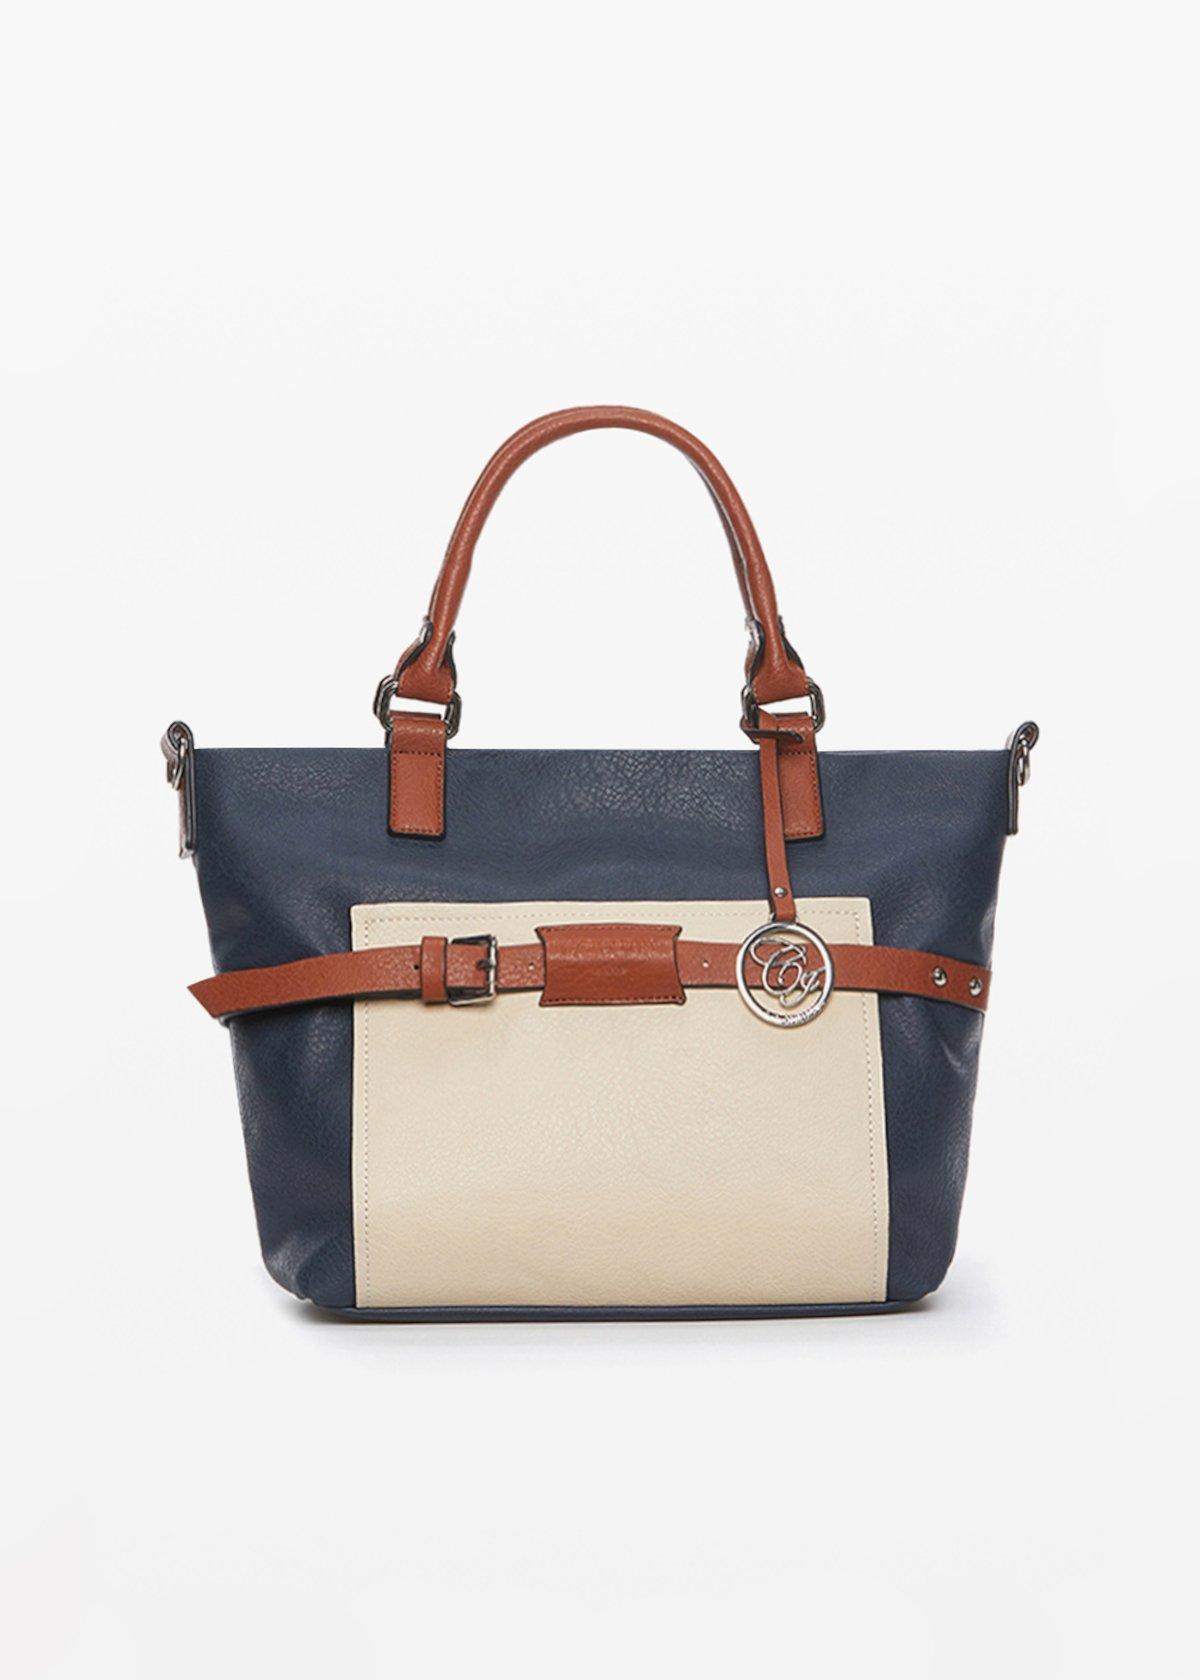 Handbag Brigida in ecopelle con tracolla - Light Beige /  Medium Blue - Donna - Immagine categoria